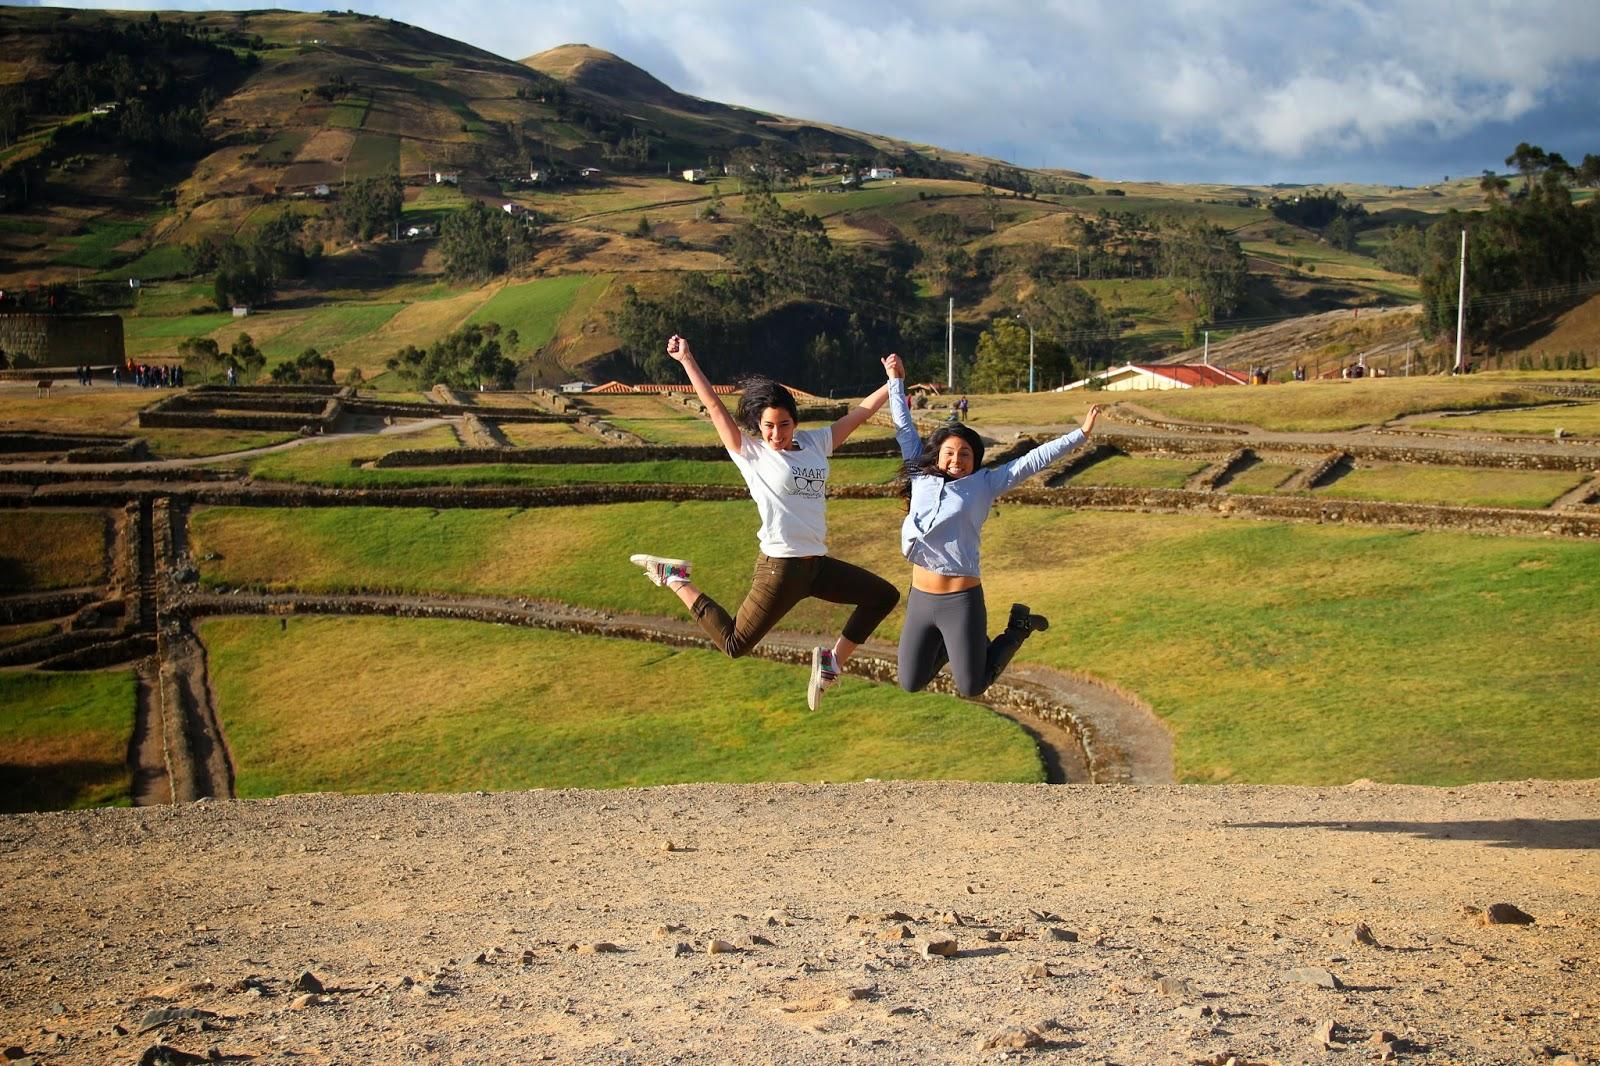 Ruinas Ingapirca, Cuenca, Ecuador, 4 All humanity